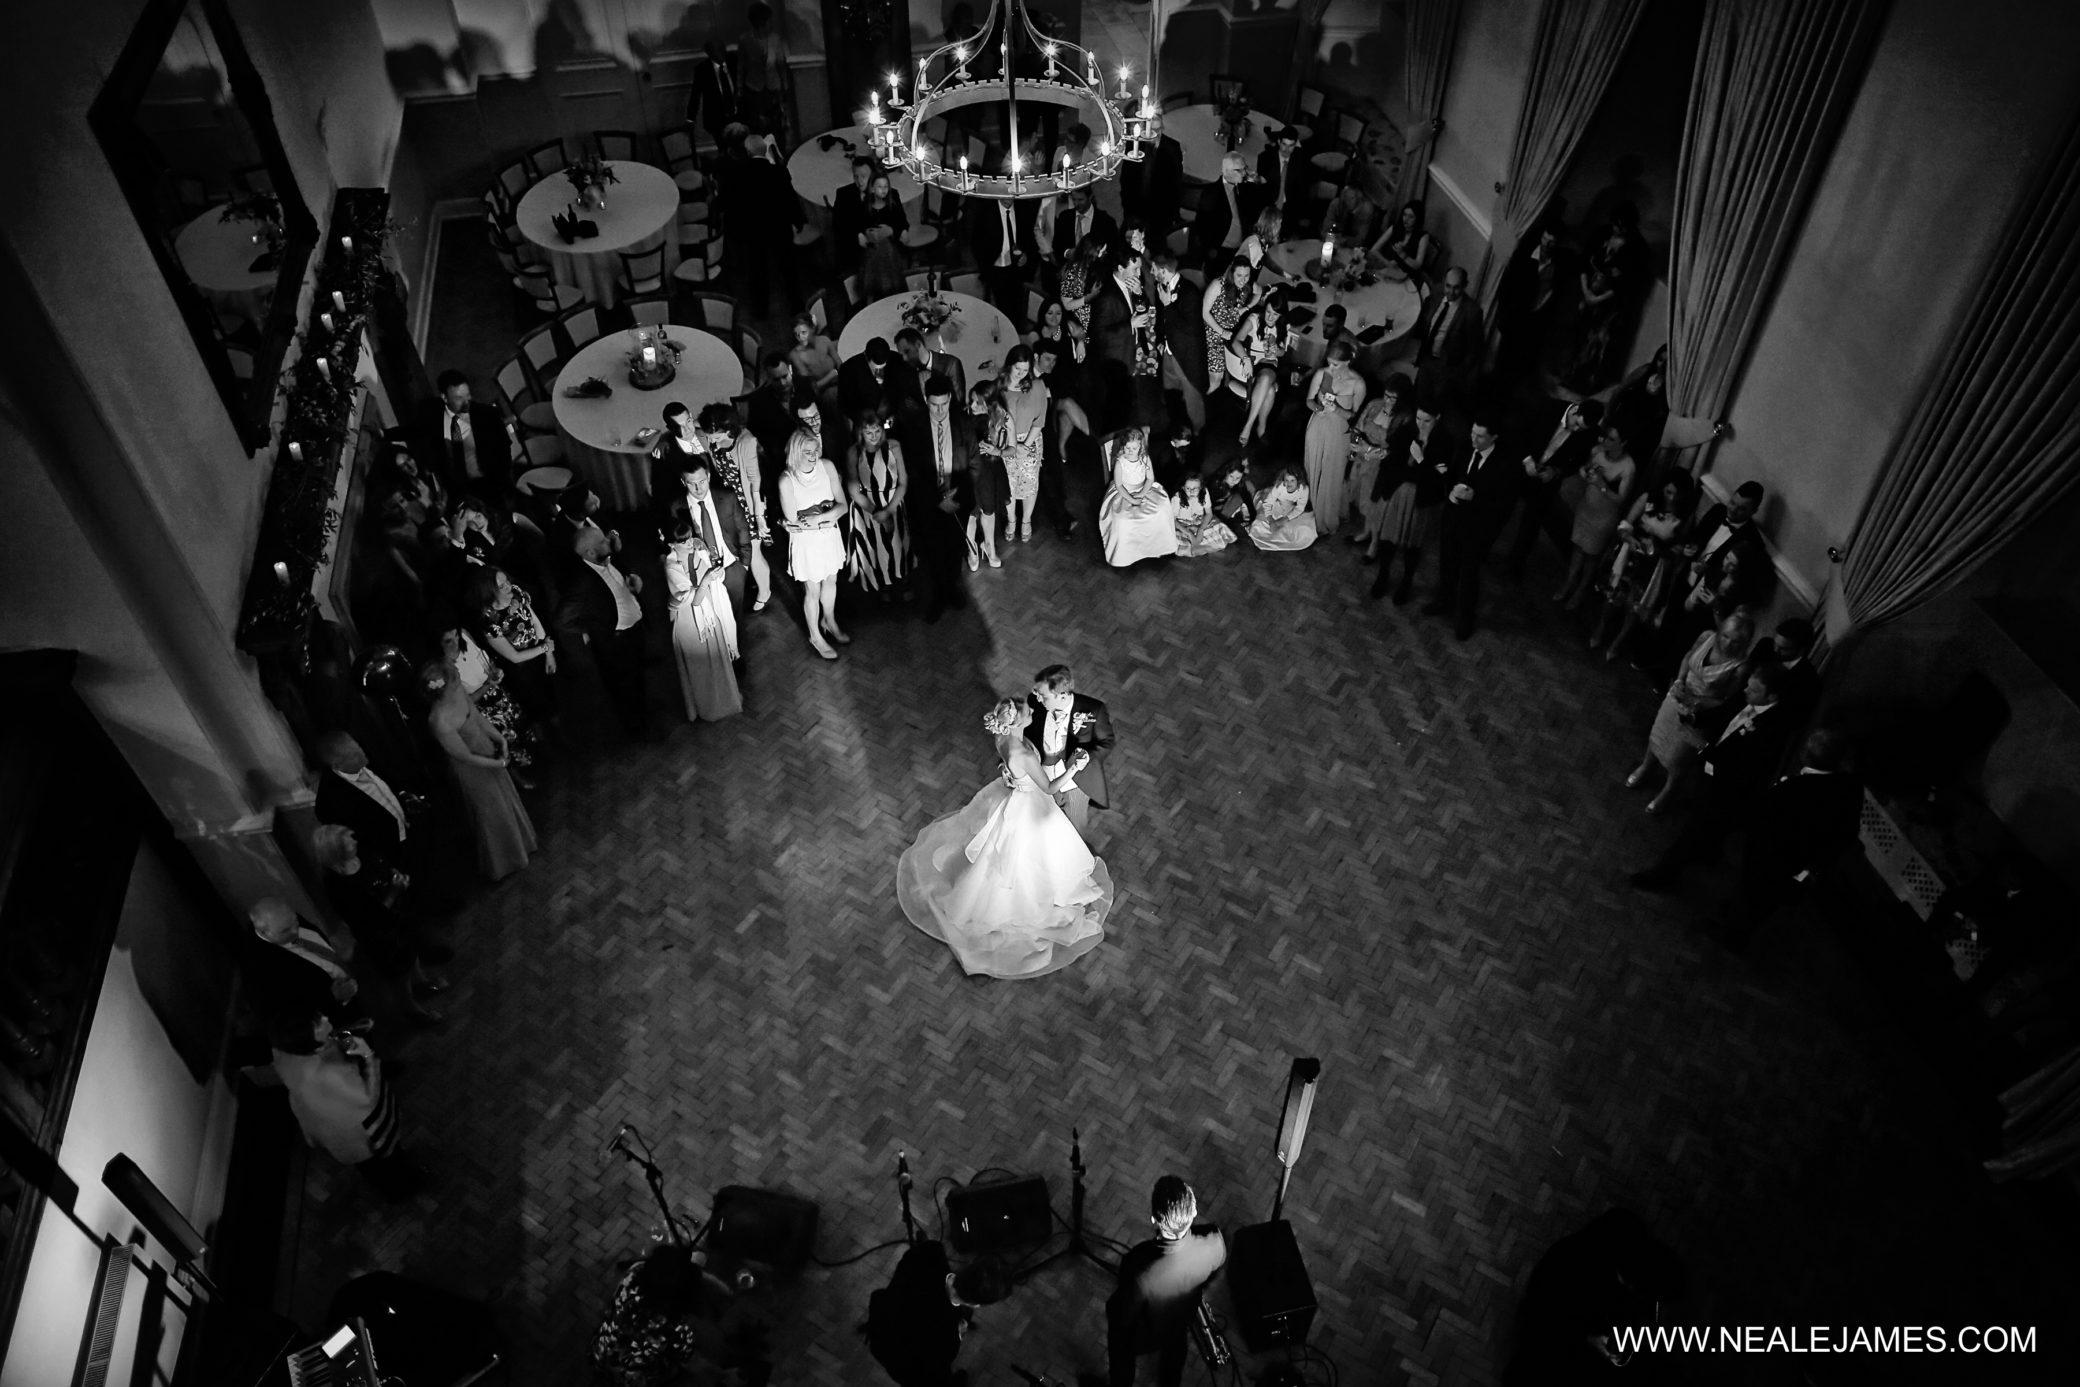 Evening wedding reception at Farnham Castle in Surrey